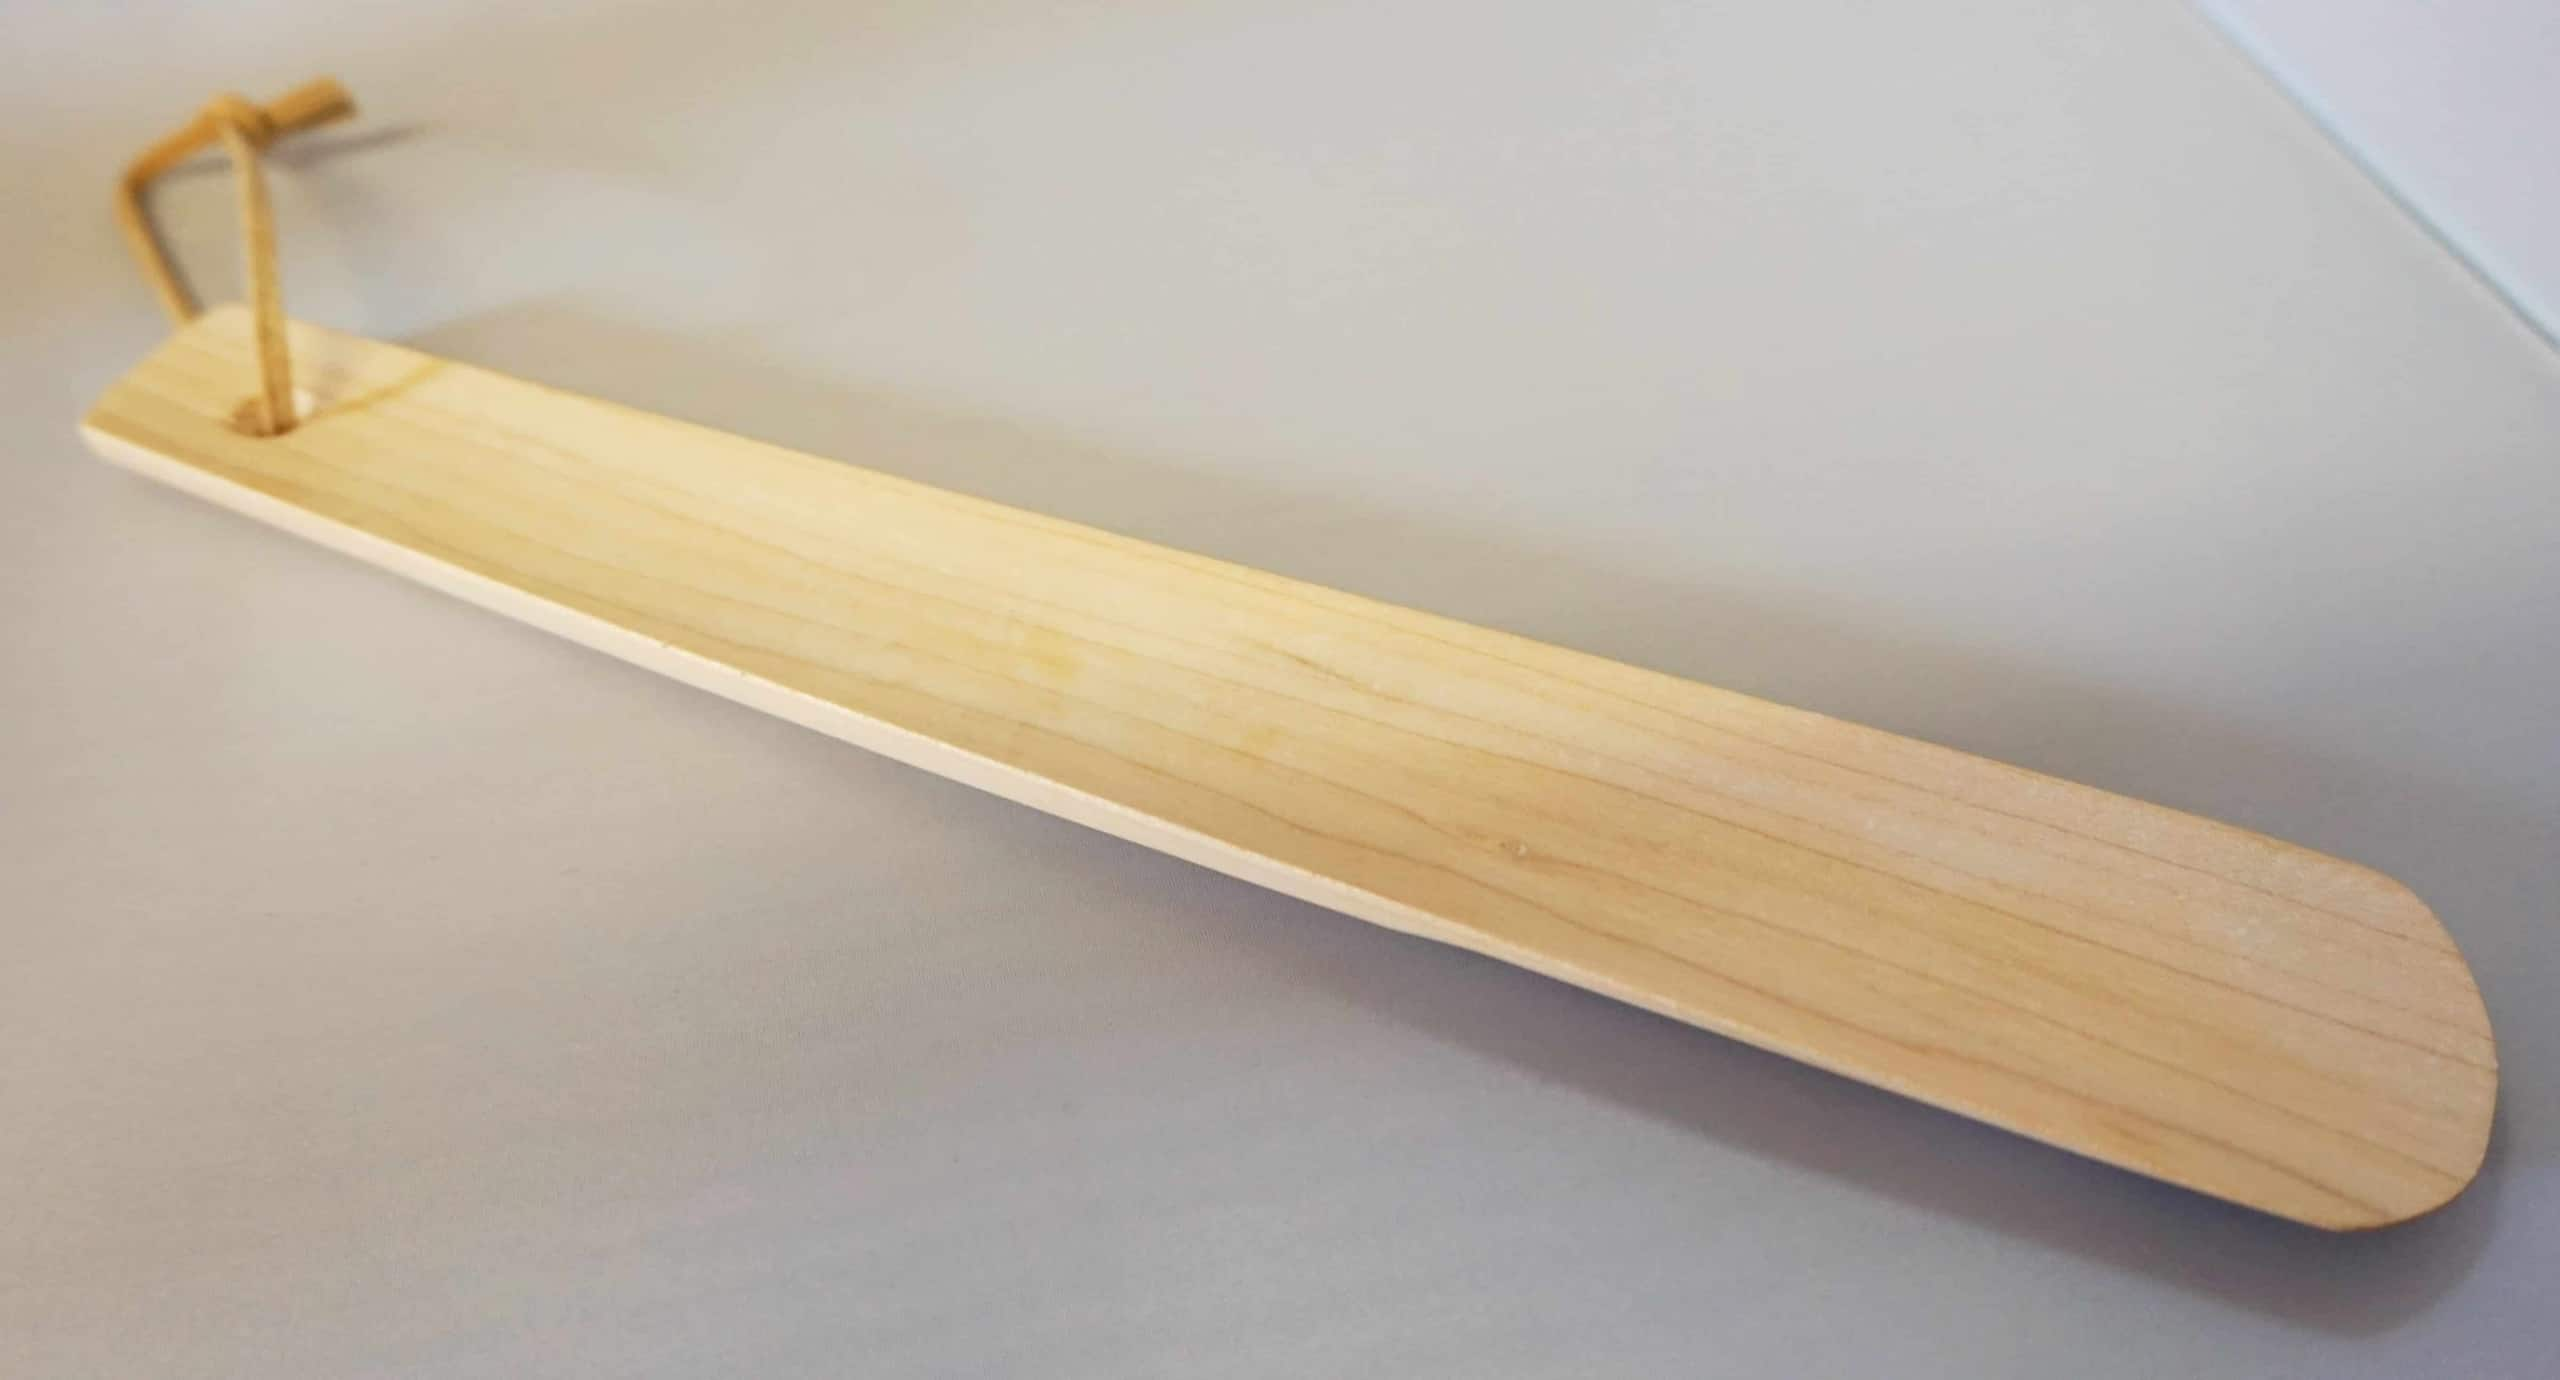 Schuhlöffel aus Ahornholz 24,5cm